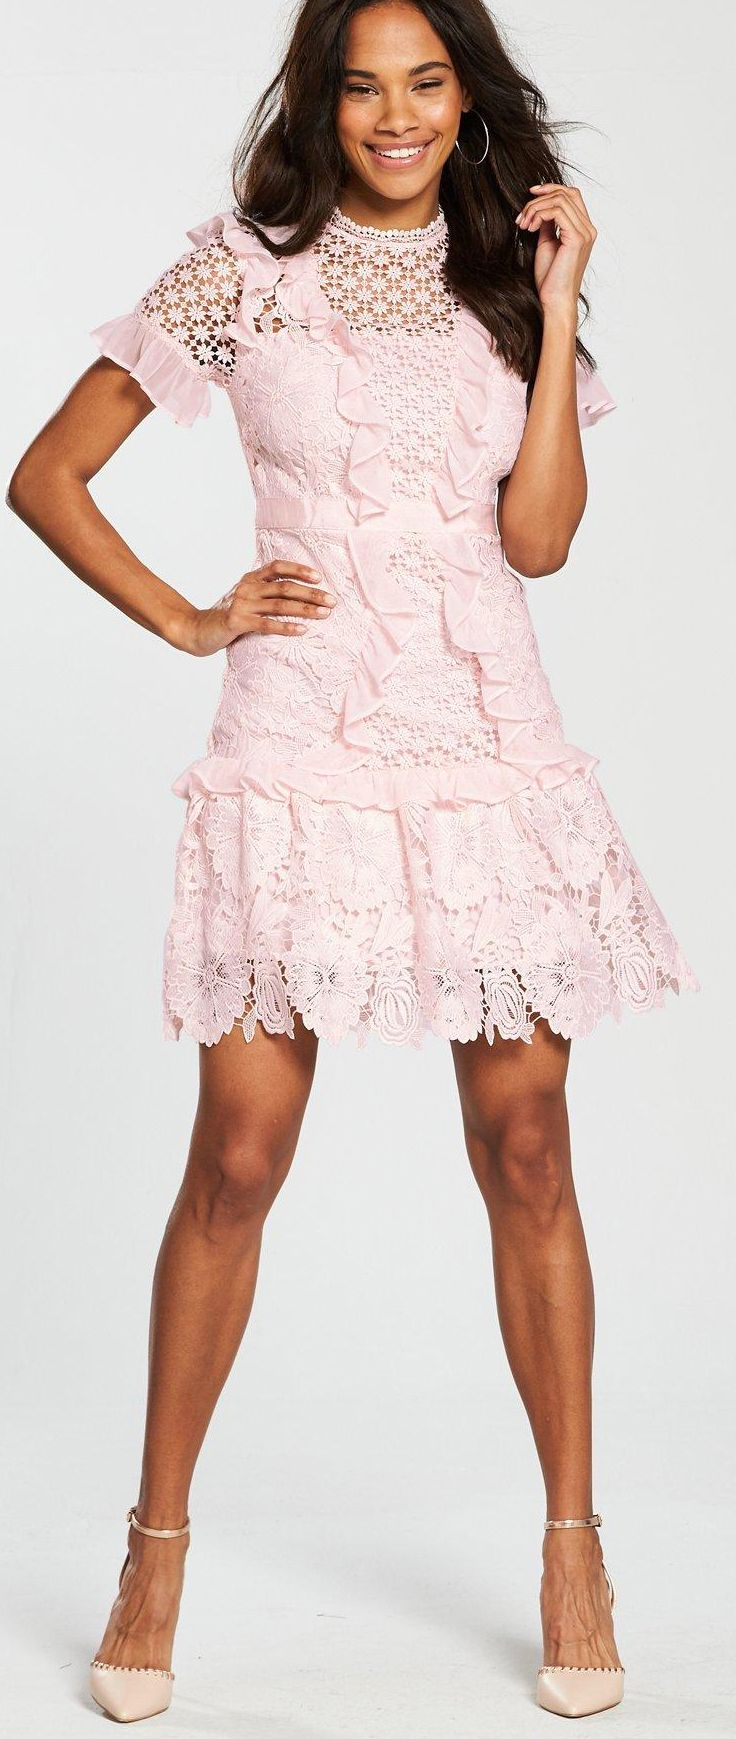 423b5980c6c7 Blush Baby Pink Lace Tiered Dress. Always on trend flirty Baby Pink.  Flirty